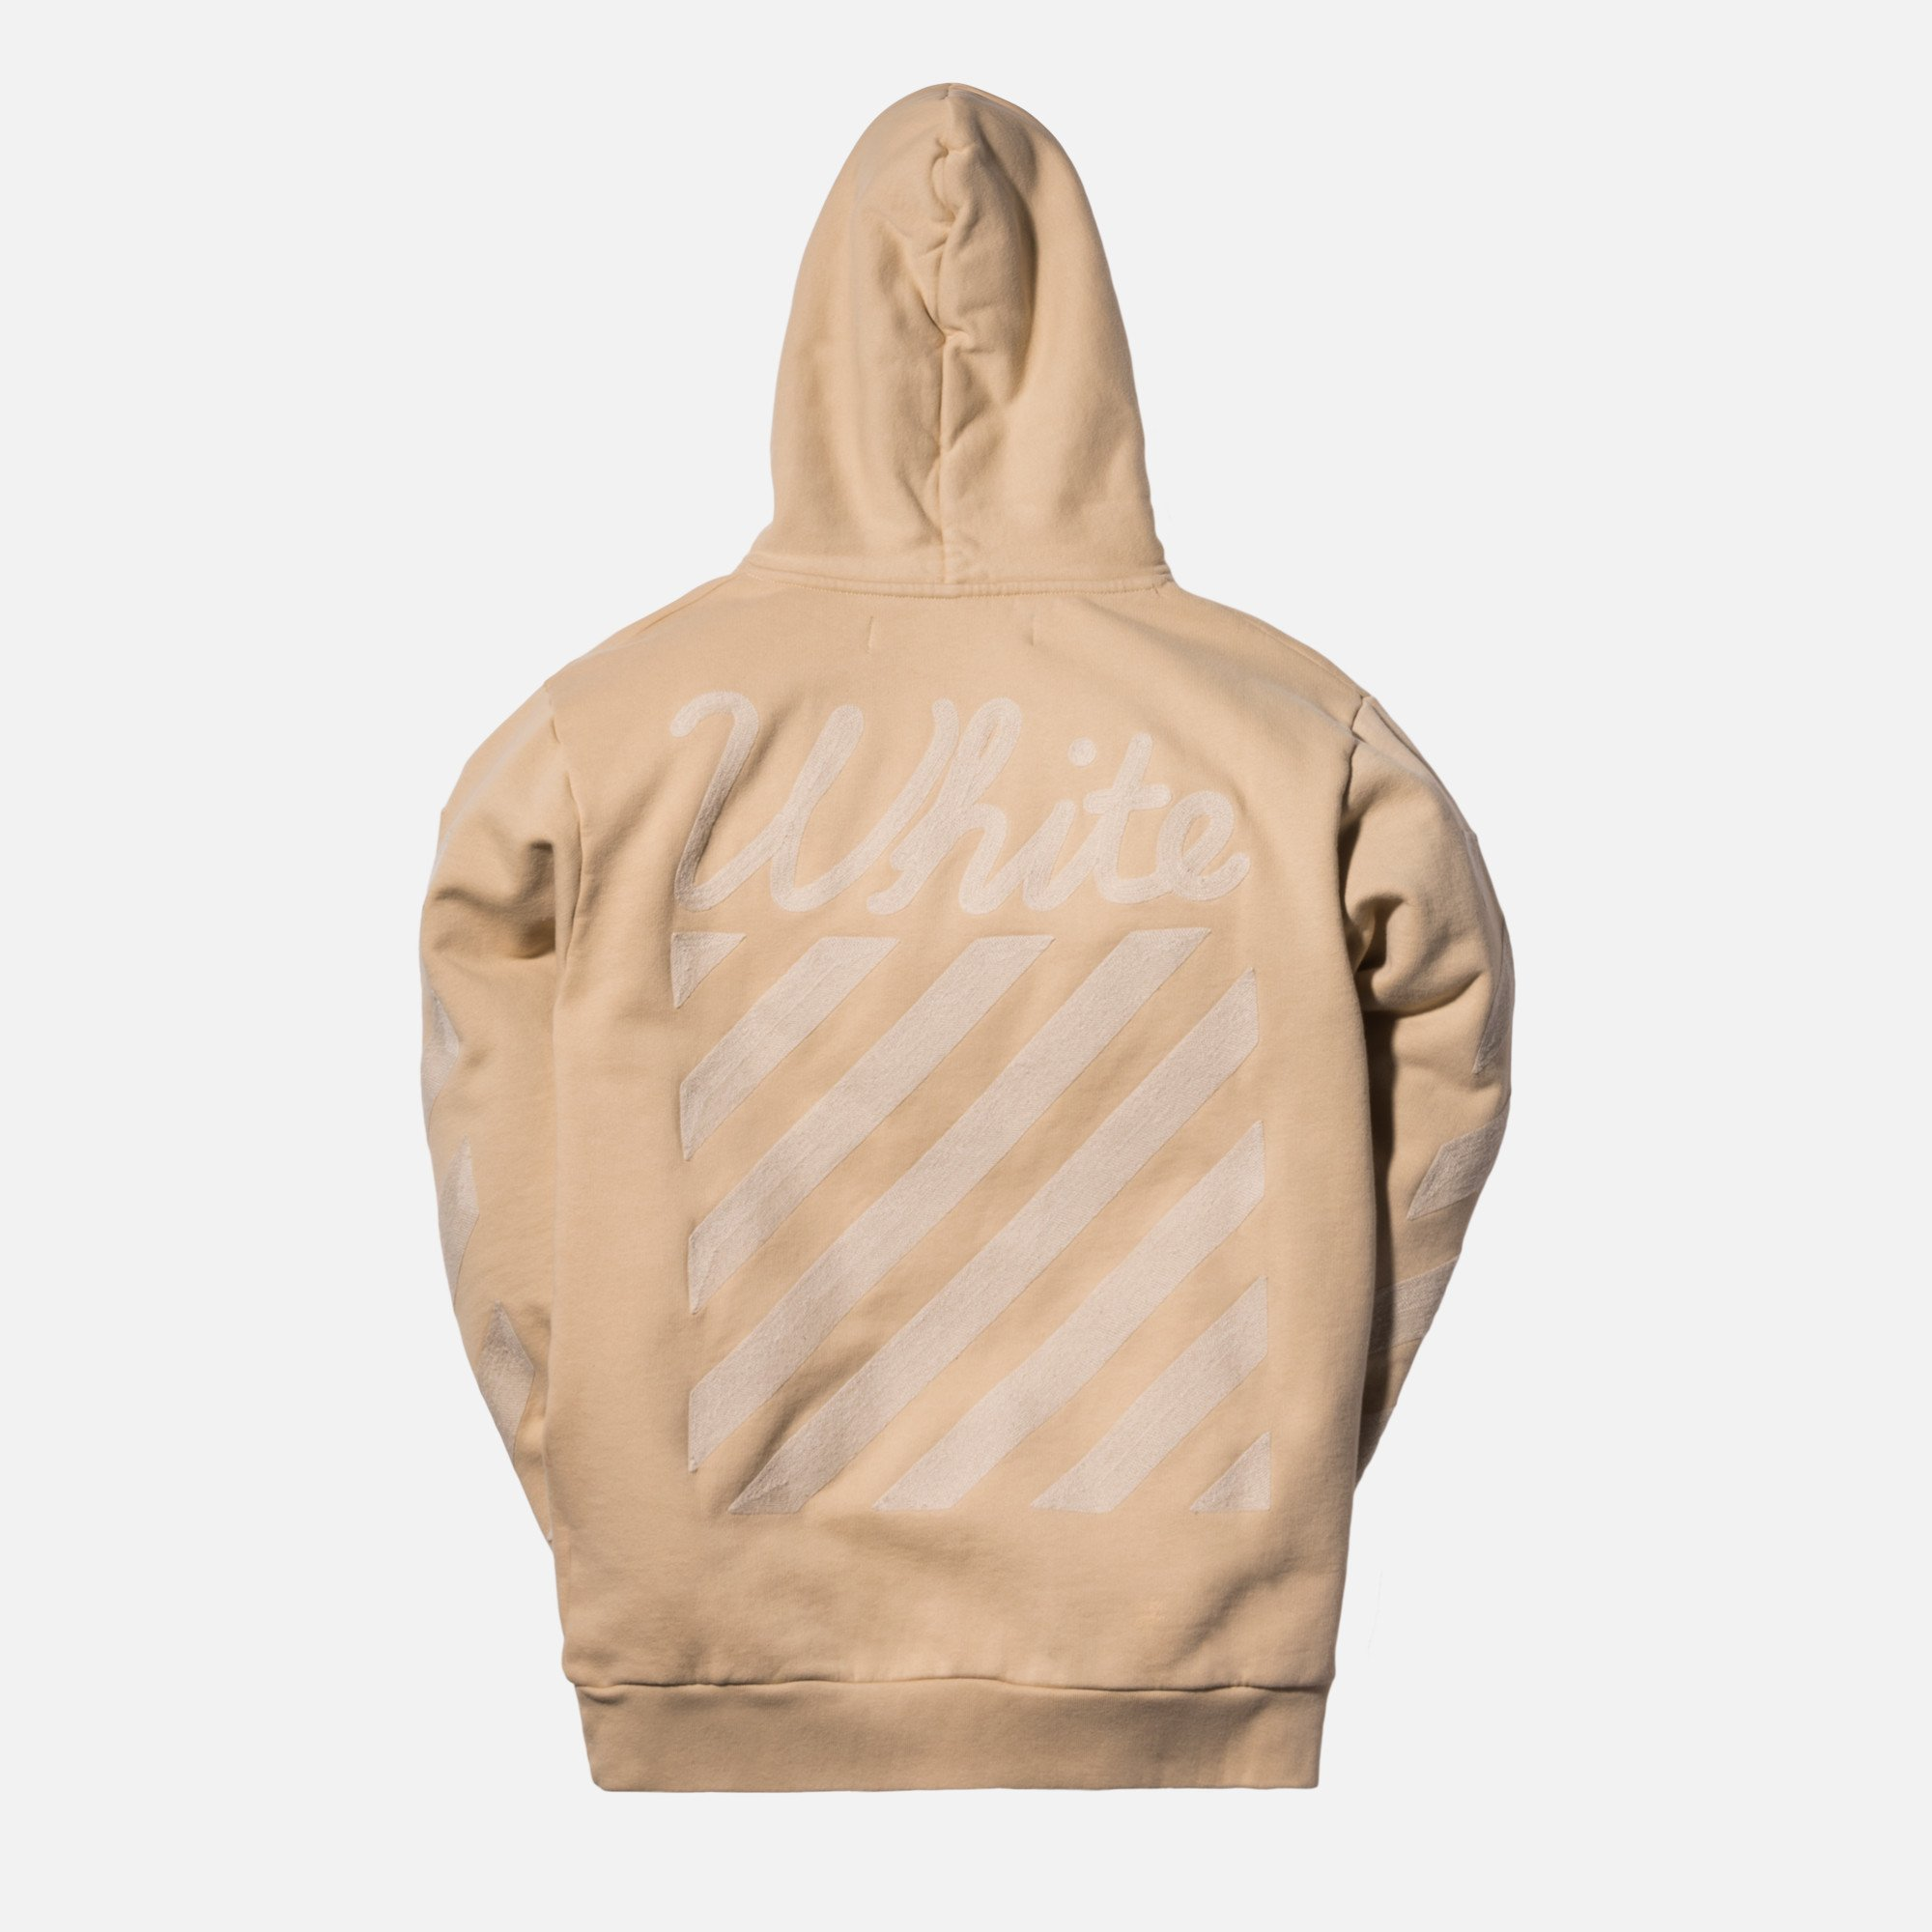 KITH-OFF-White-Tonal-hoodie